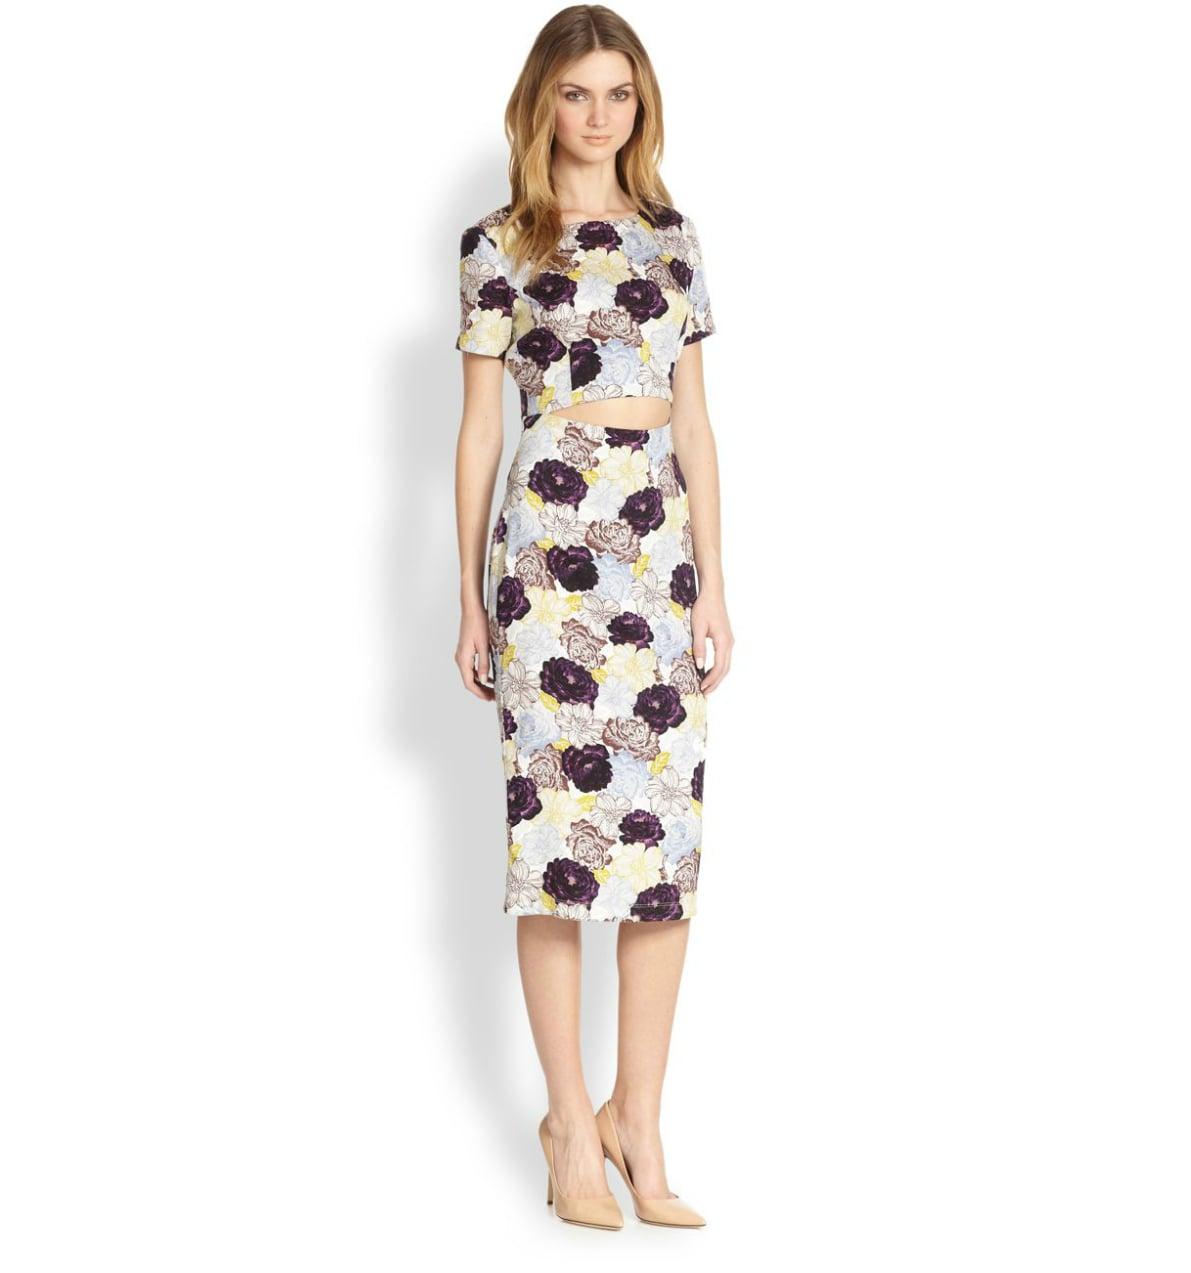 Suno Floral Cutout Dress